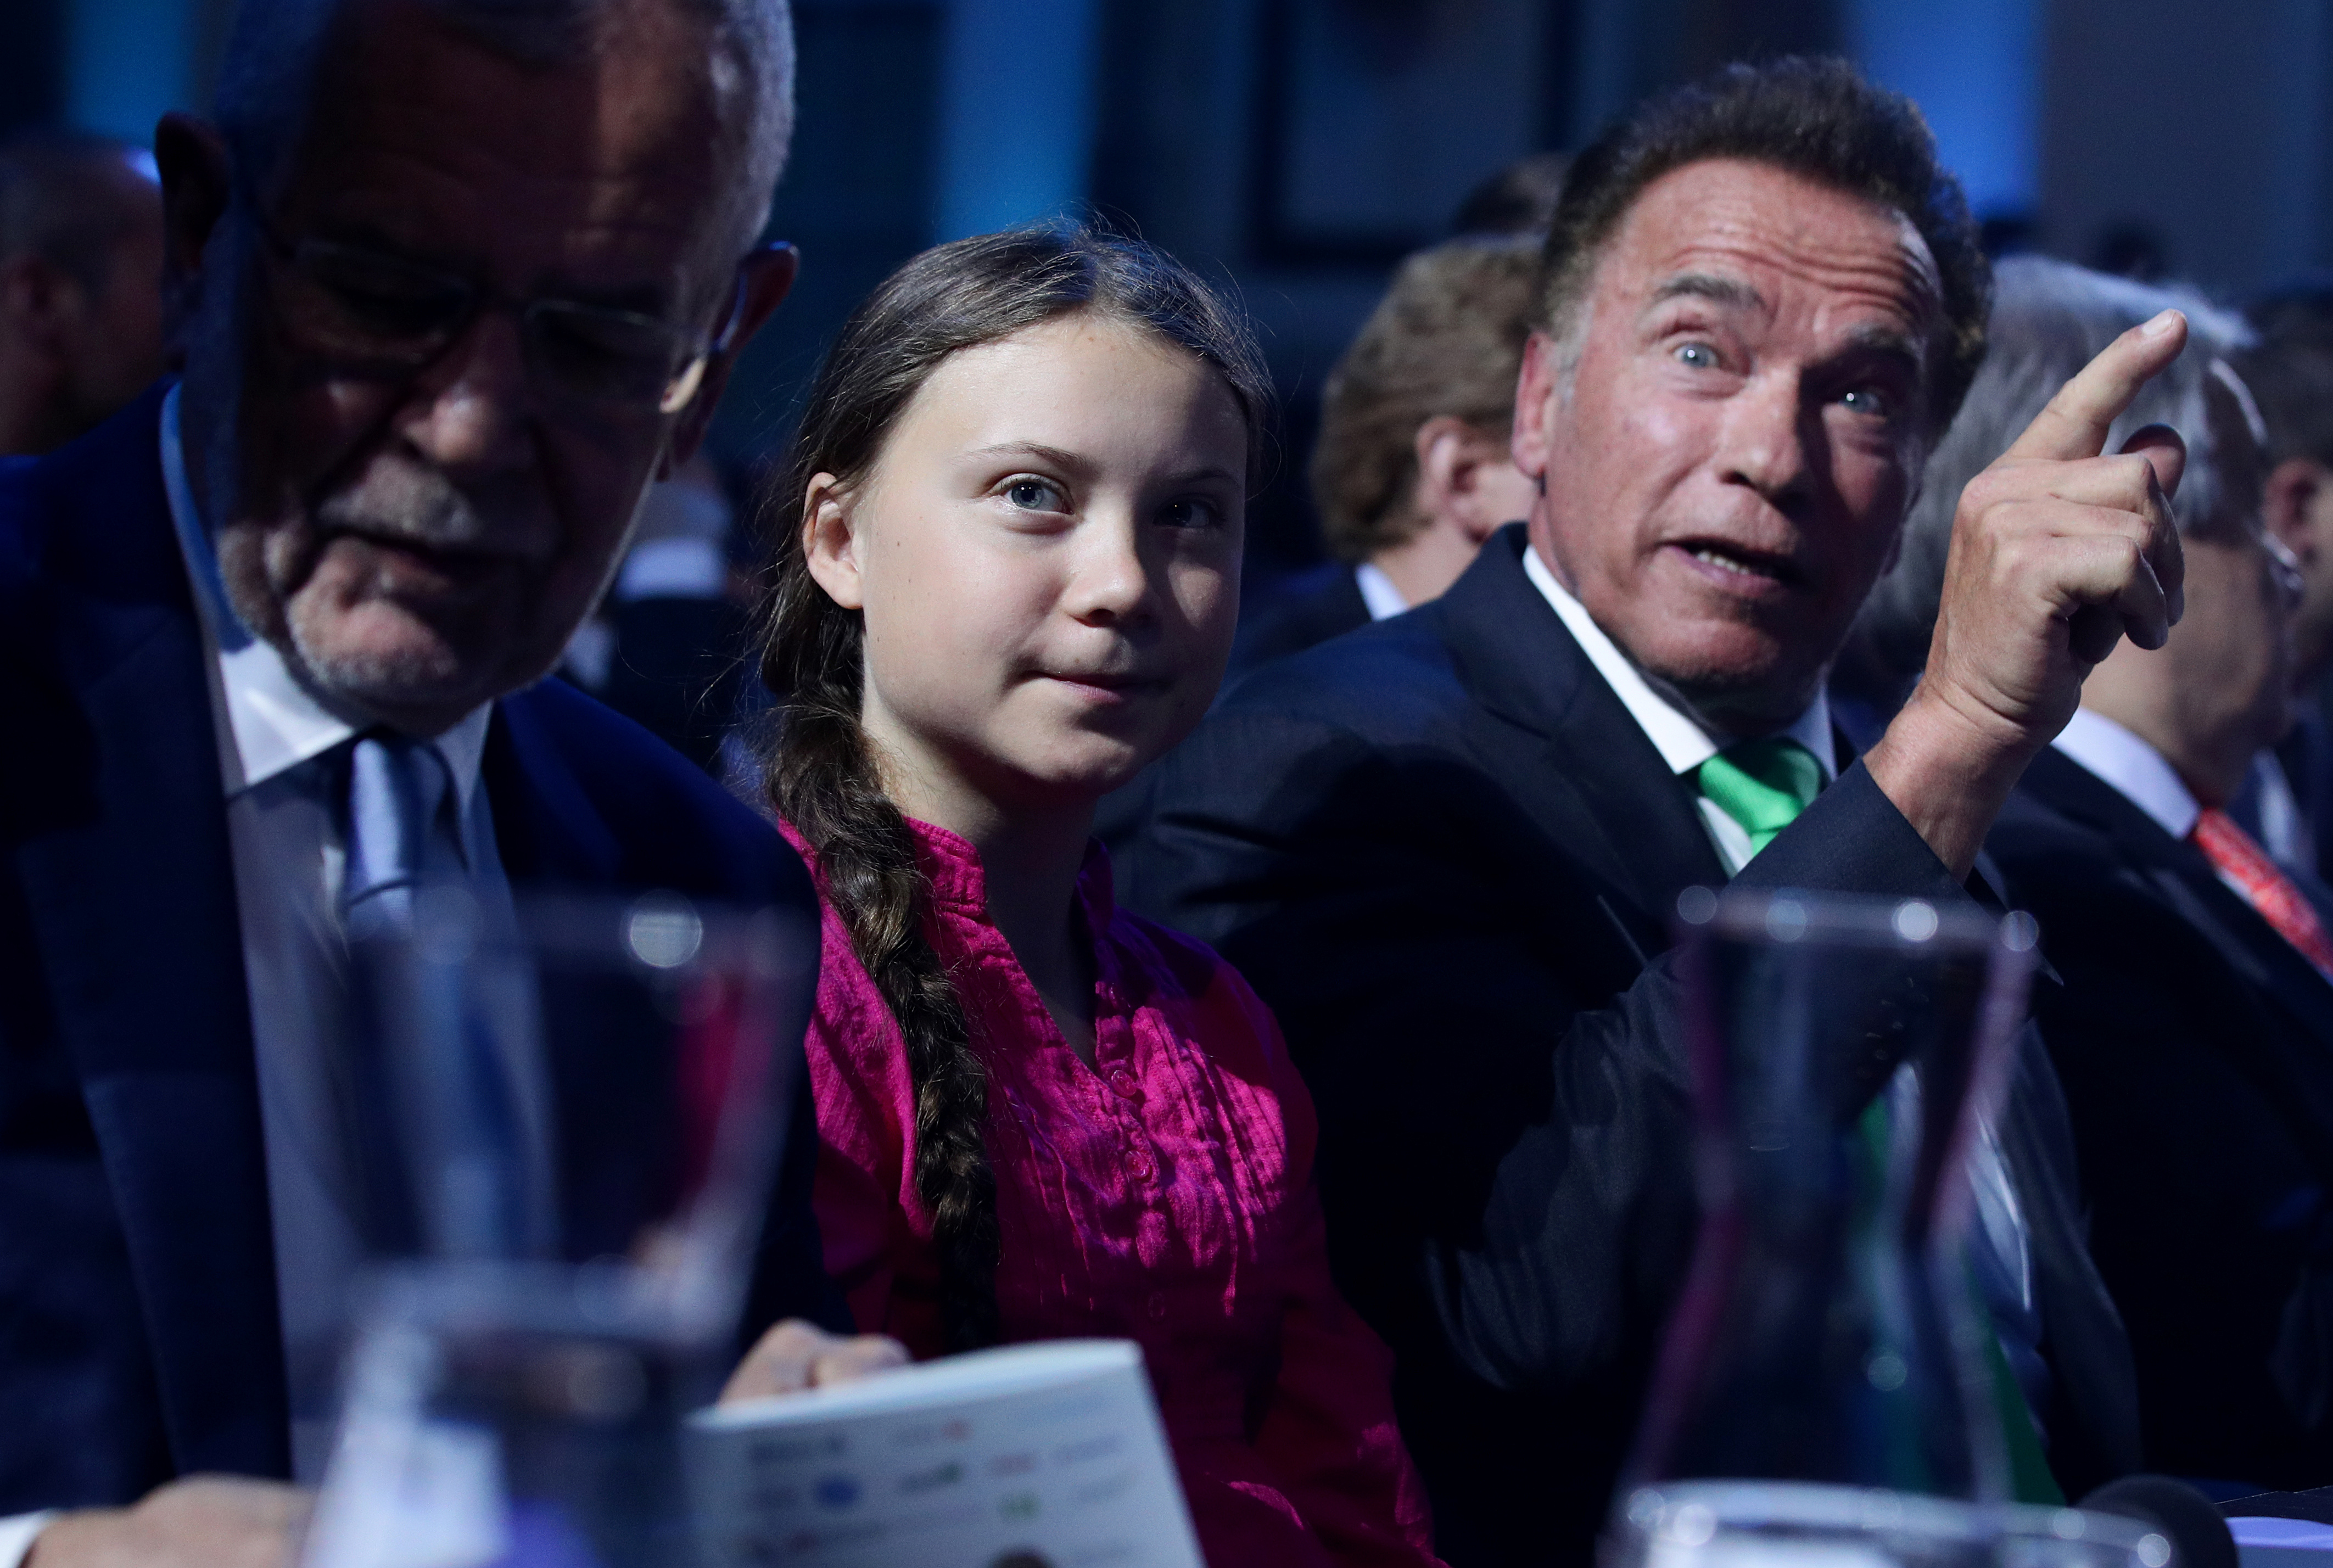 Former California Governor Arnold Schwarzenegger reacts next to Swedish climate activist Greta Thunberg and Austrian President Alexander Van der Bellen during the R20 Austrian World Summit in Vienna, Austria, May 28, 2019. REUTERS/Lisi Niesner